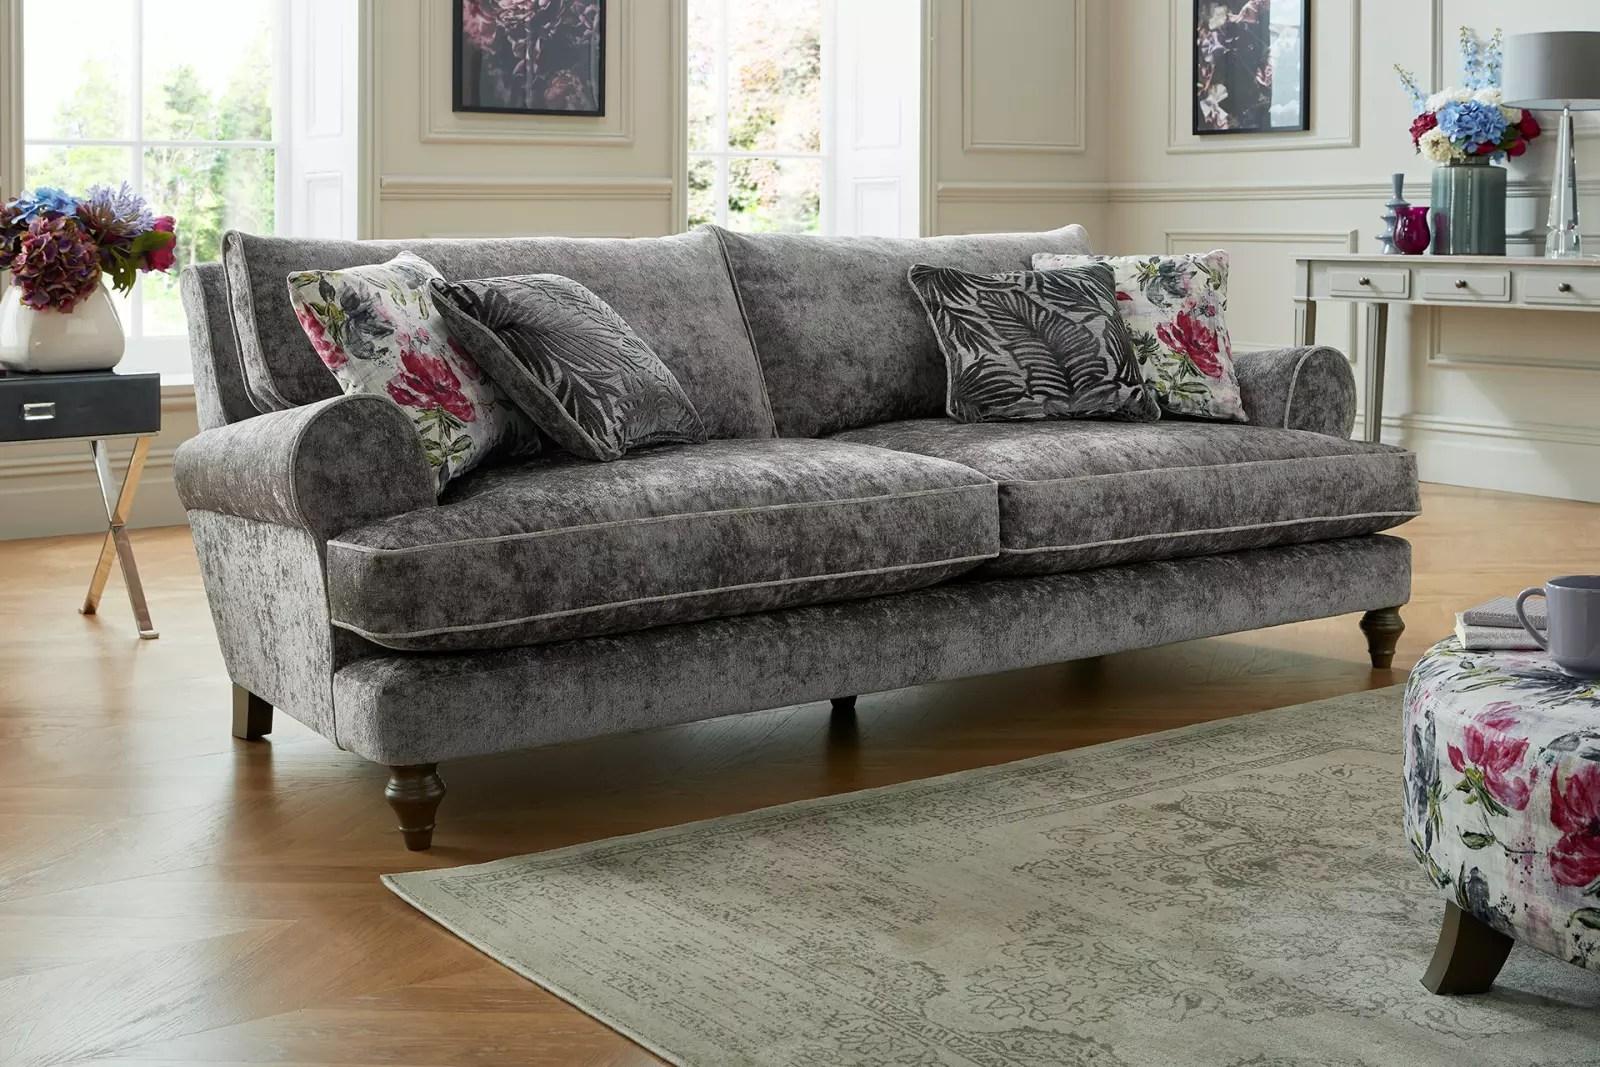 paloma sofa sofology leather sofas buffalo ny outlet lines open 8am 11pm